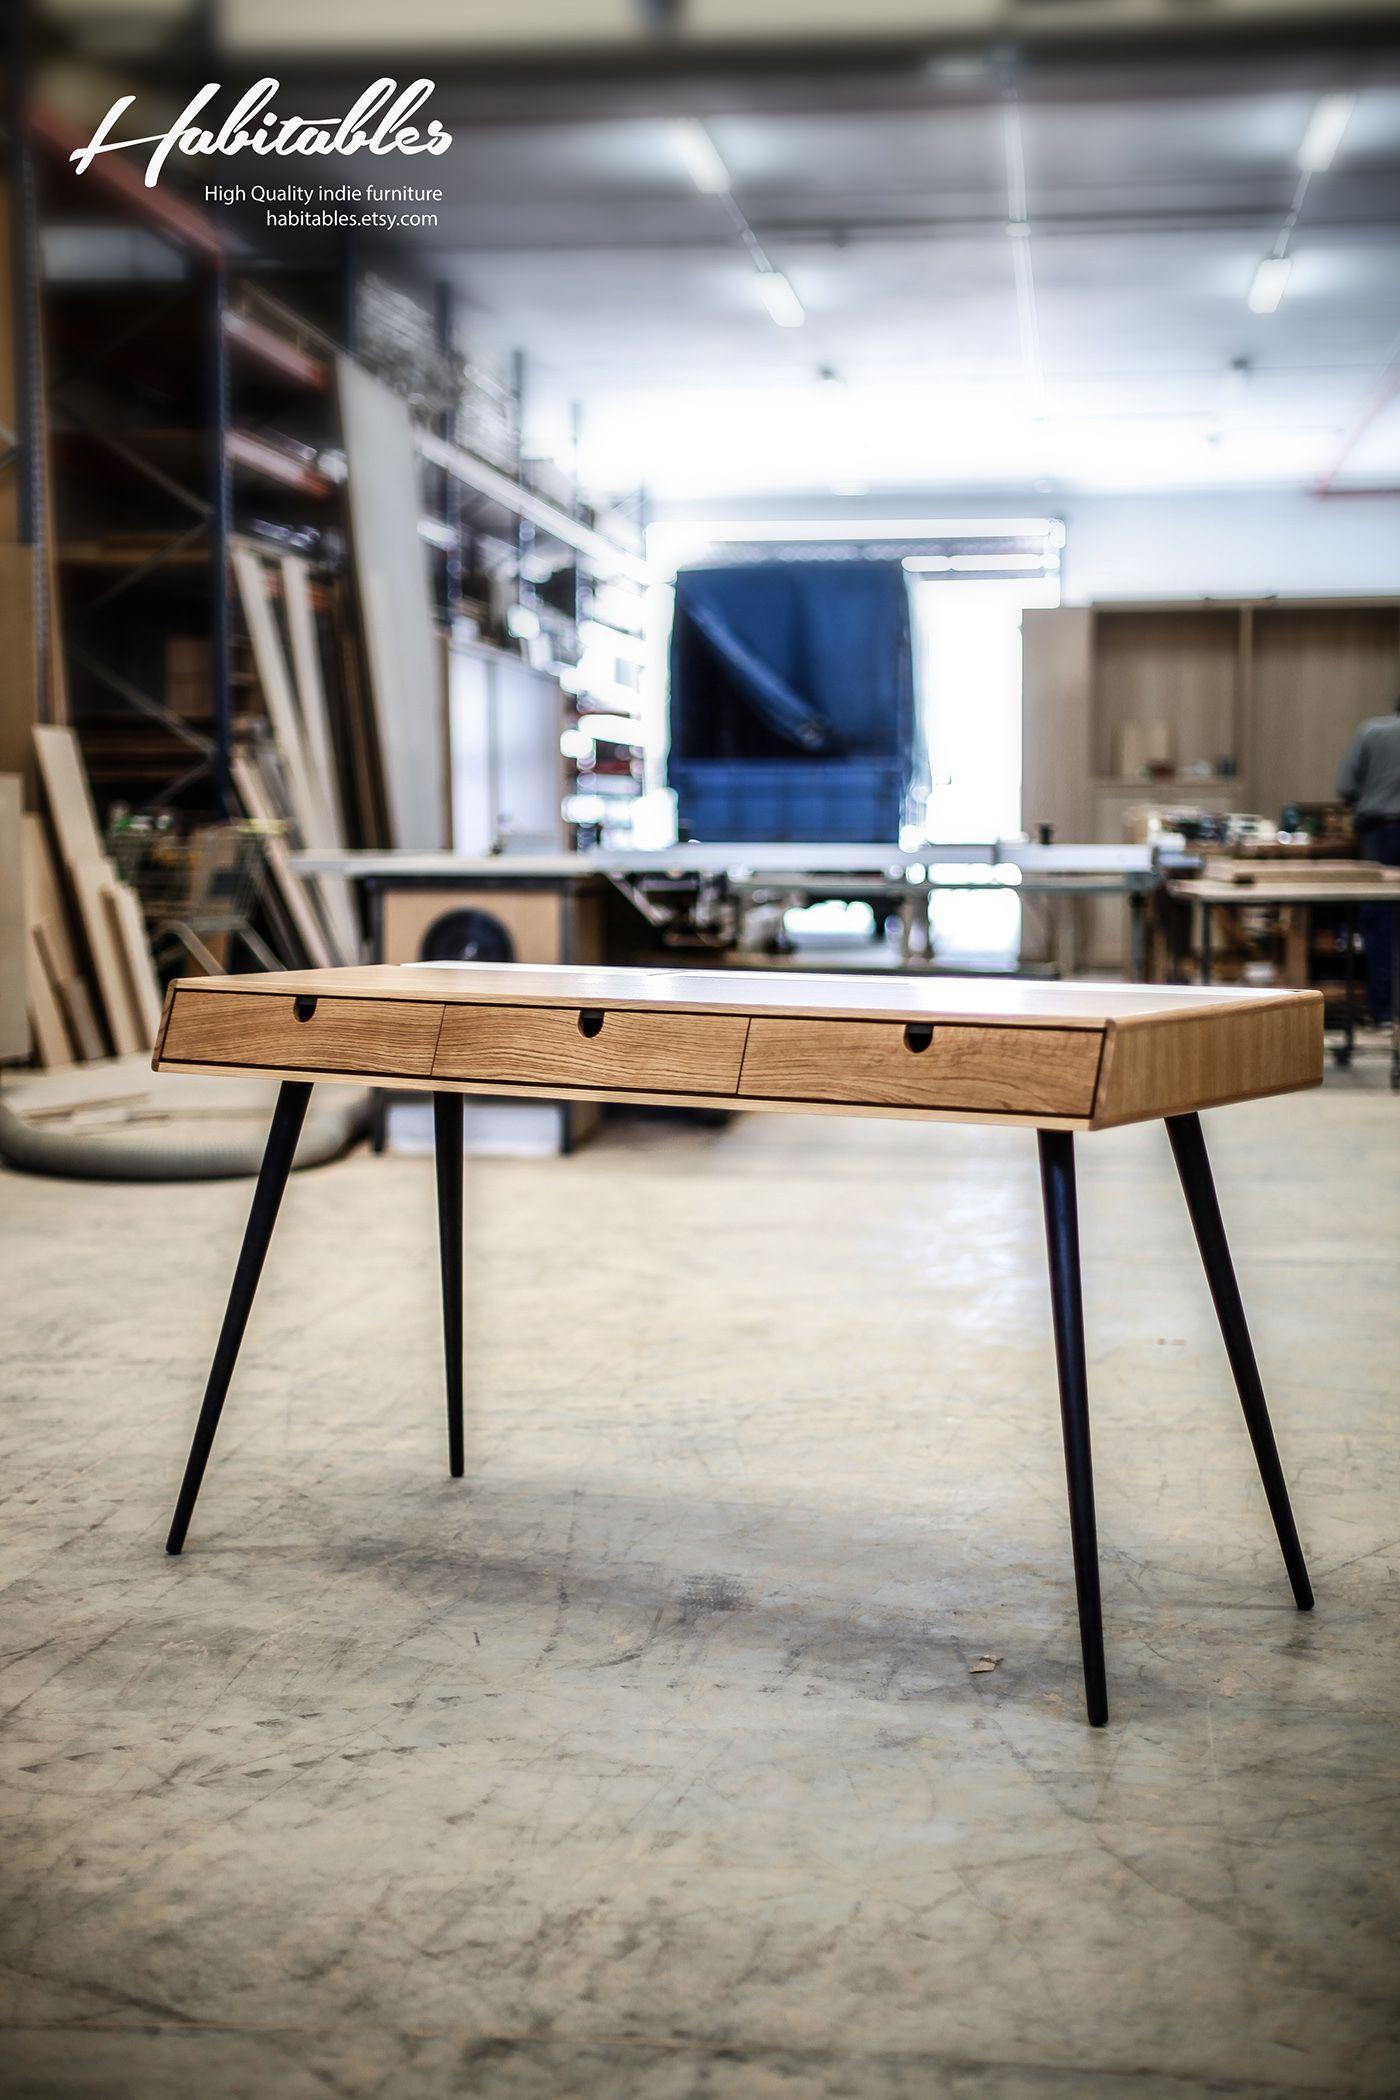 Desk ,bureau, escritorio in oak wood 140 cm on Behance